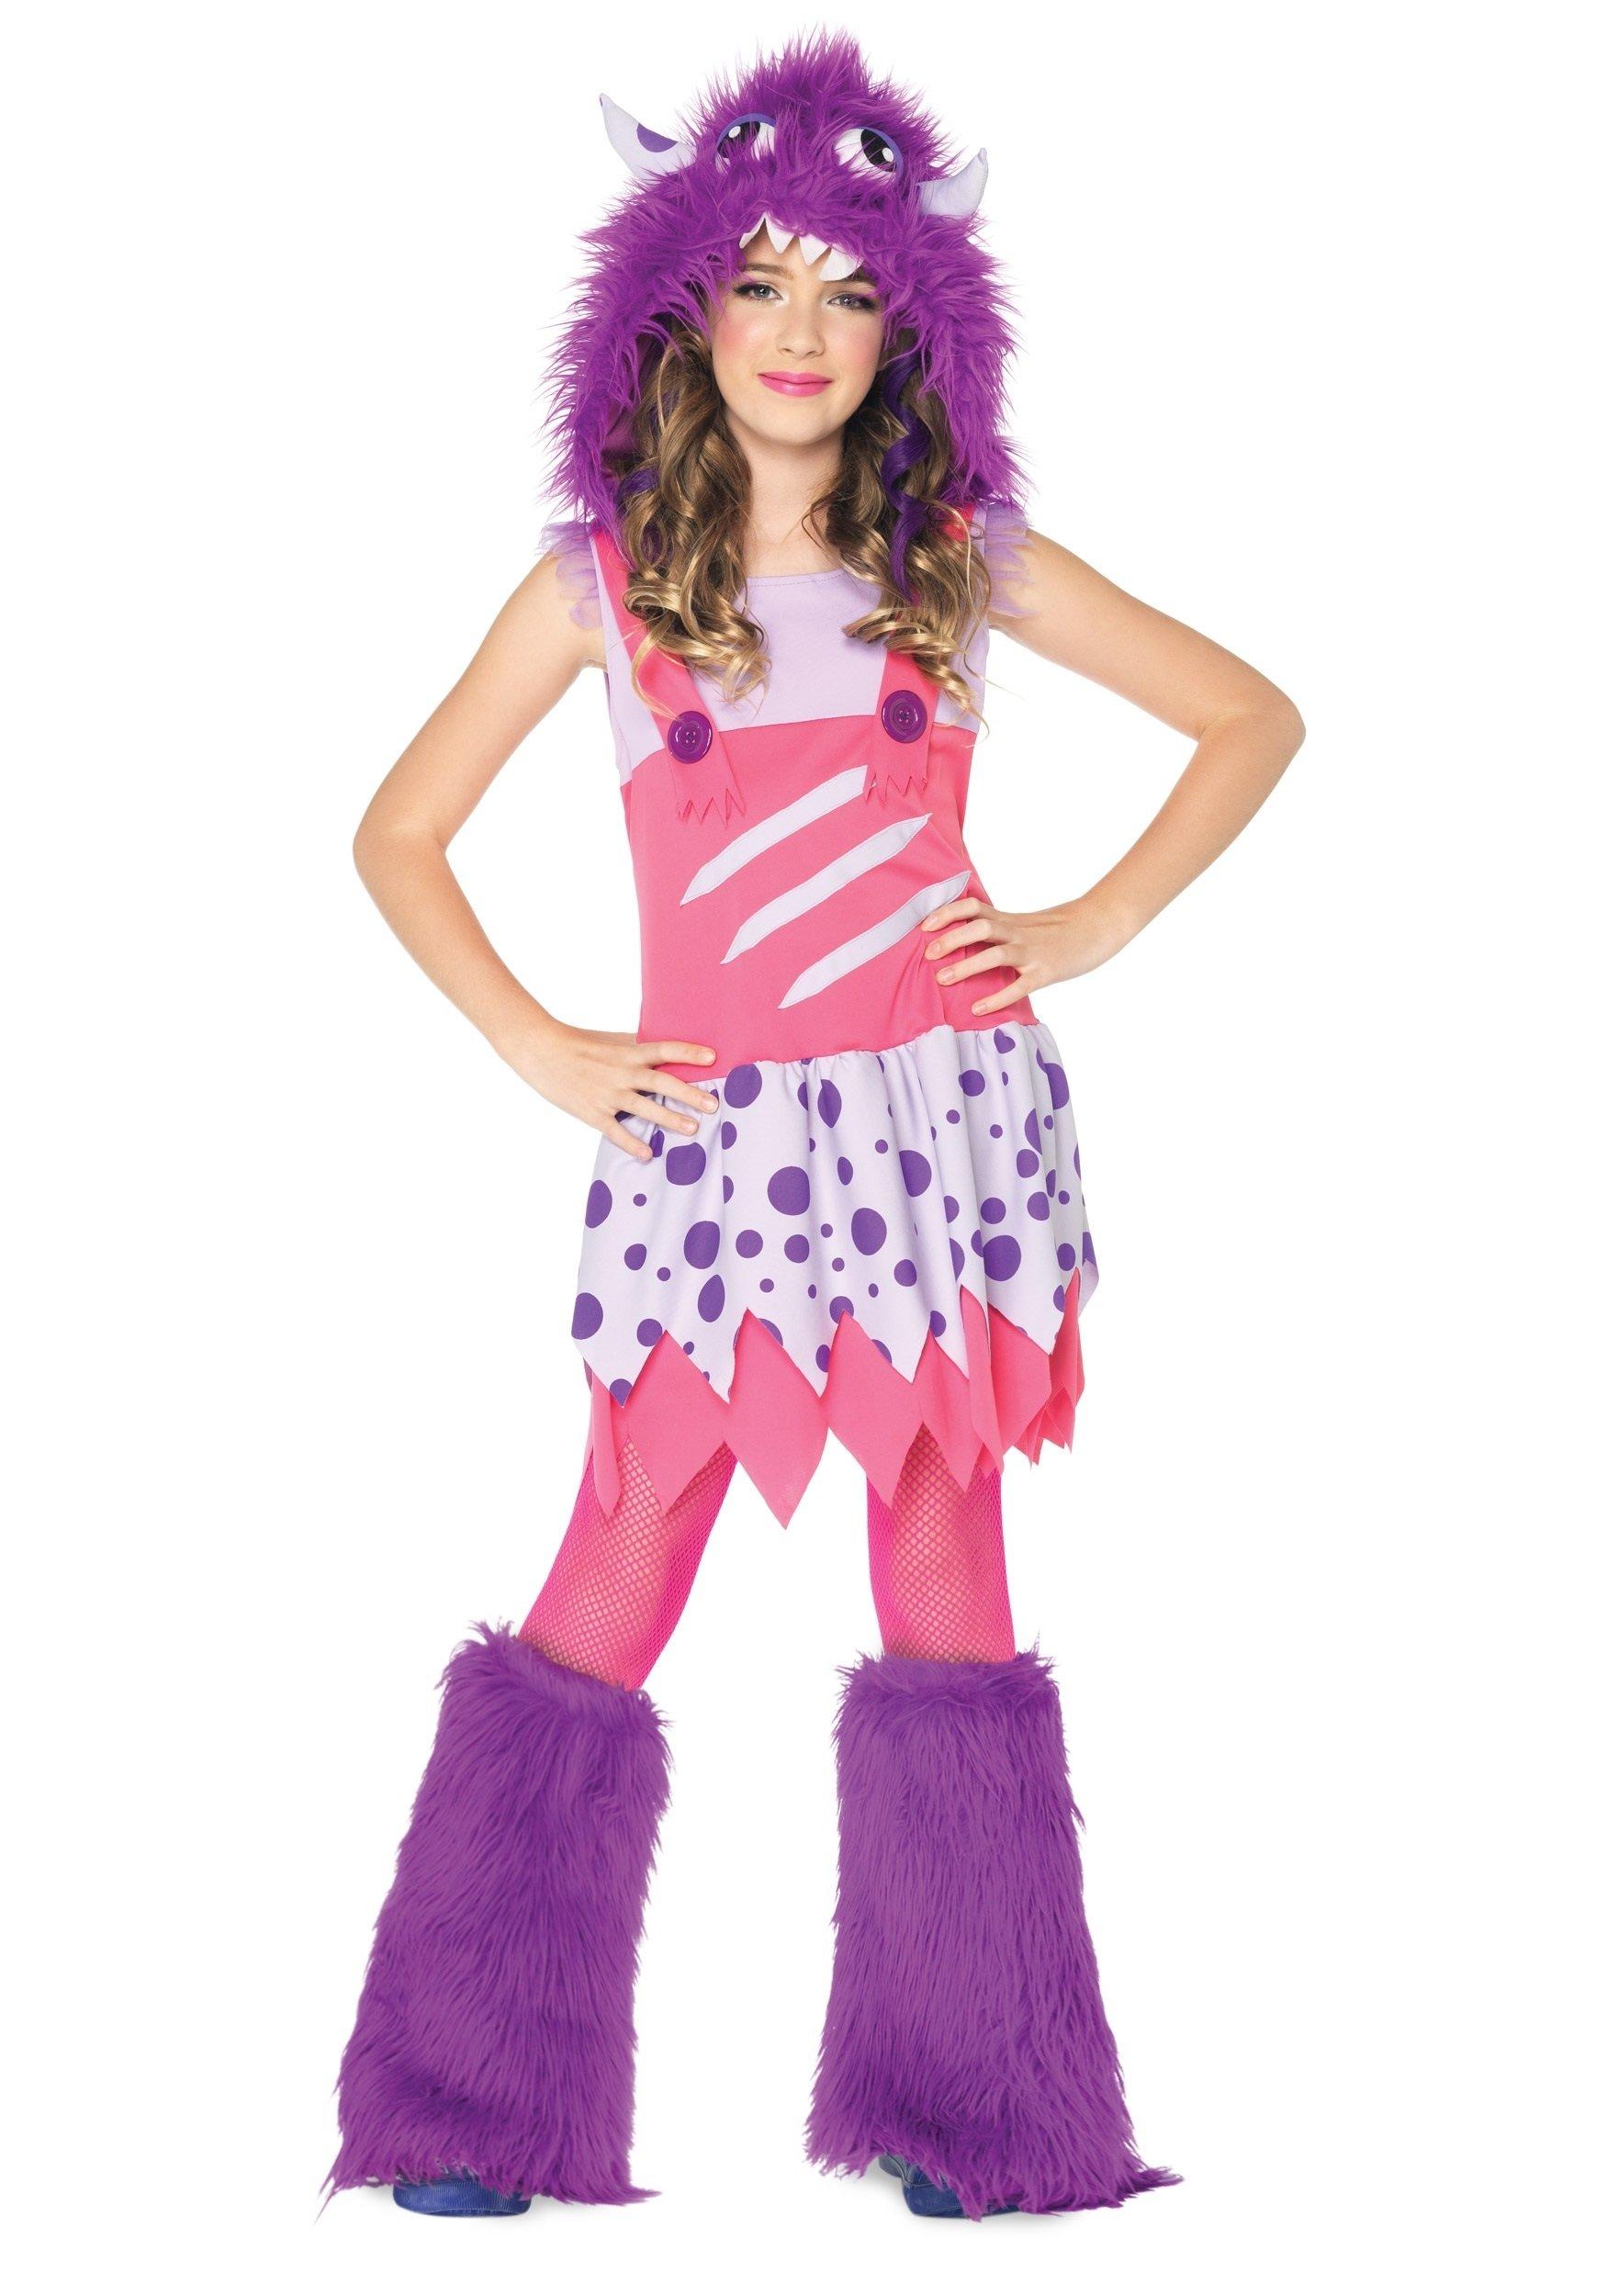 10 Beautiful Cute Girl Halloween Costume Ideas girls furball monster costume halloween costume ideas 2016  sc 1 th 268 & 10 Beautiful Cute Girl Halloween Costume Ideas